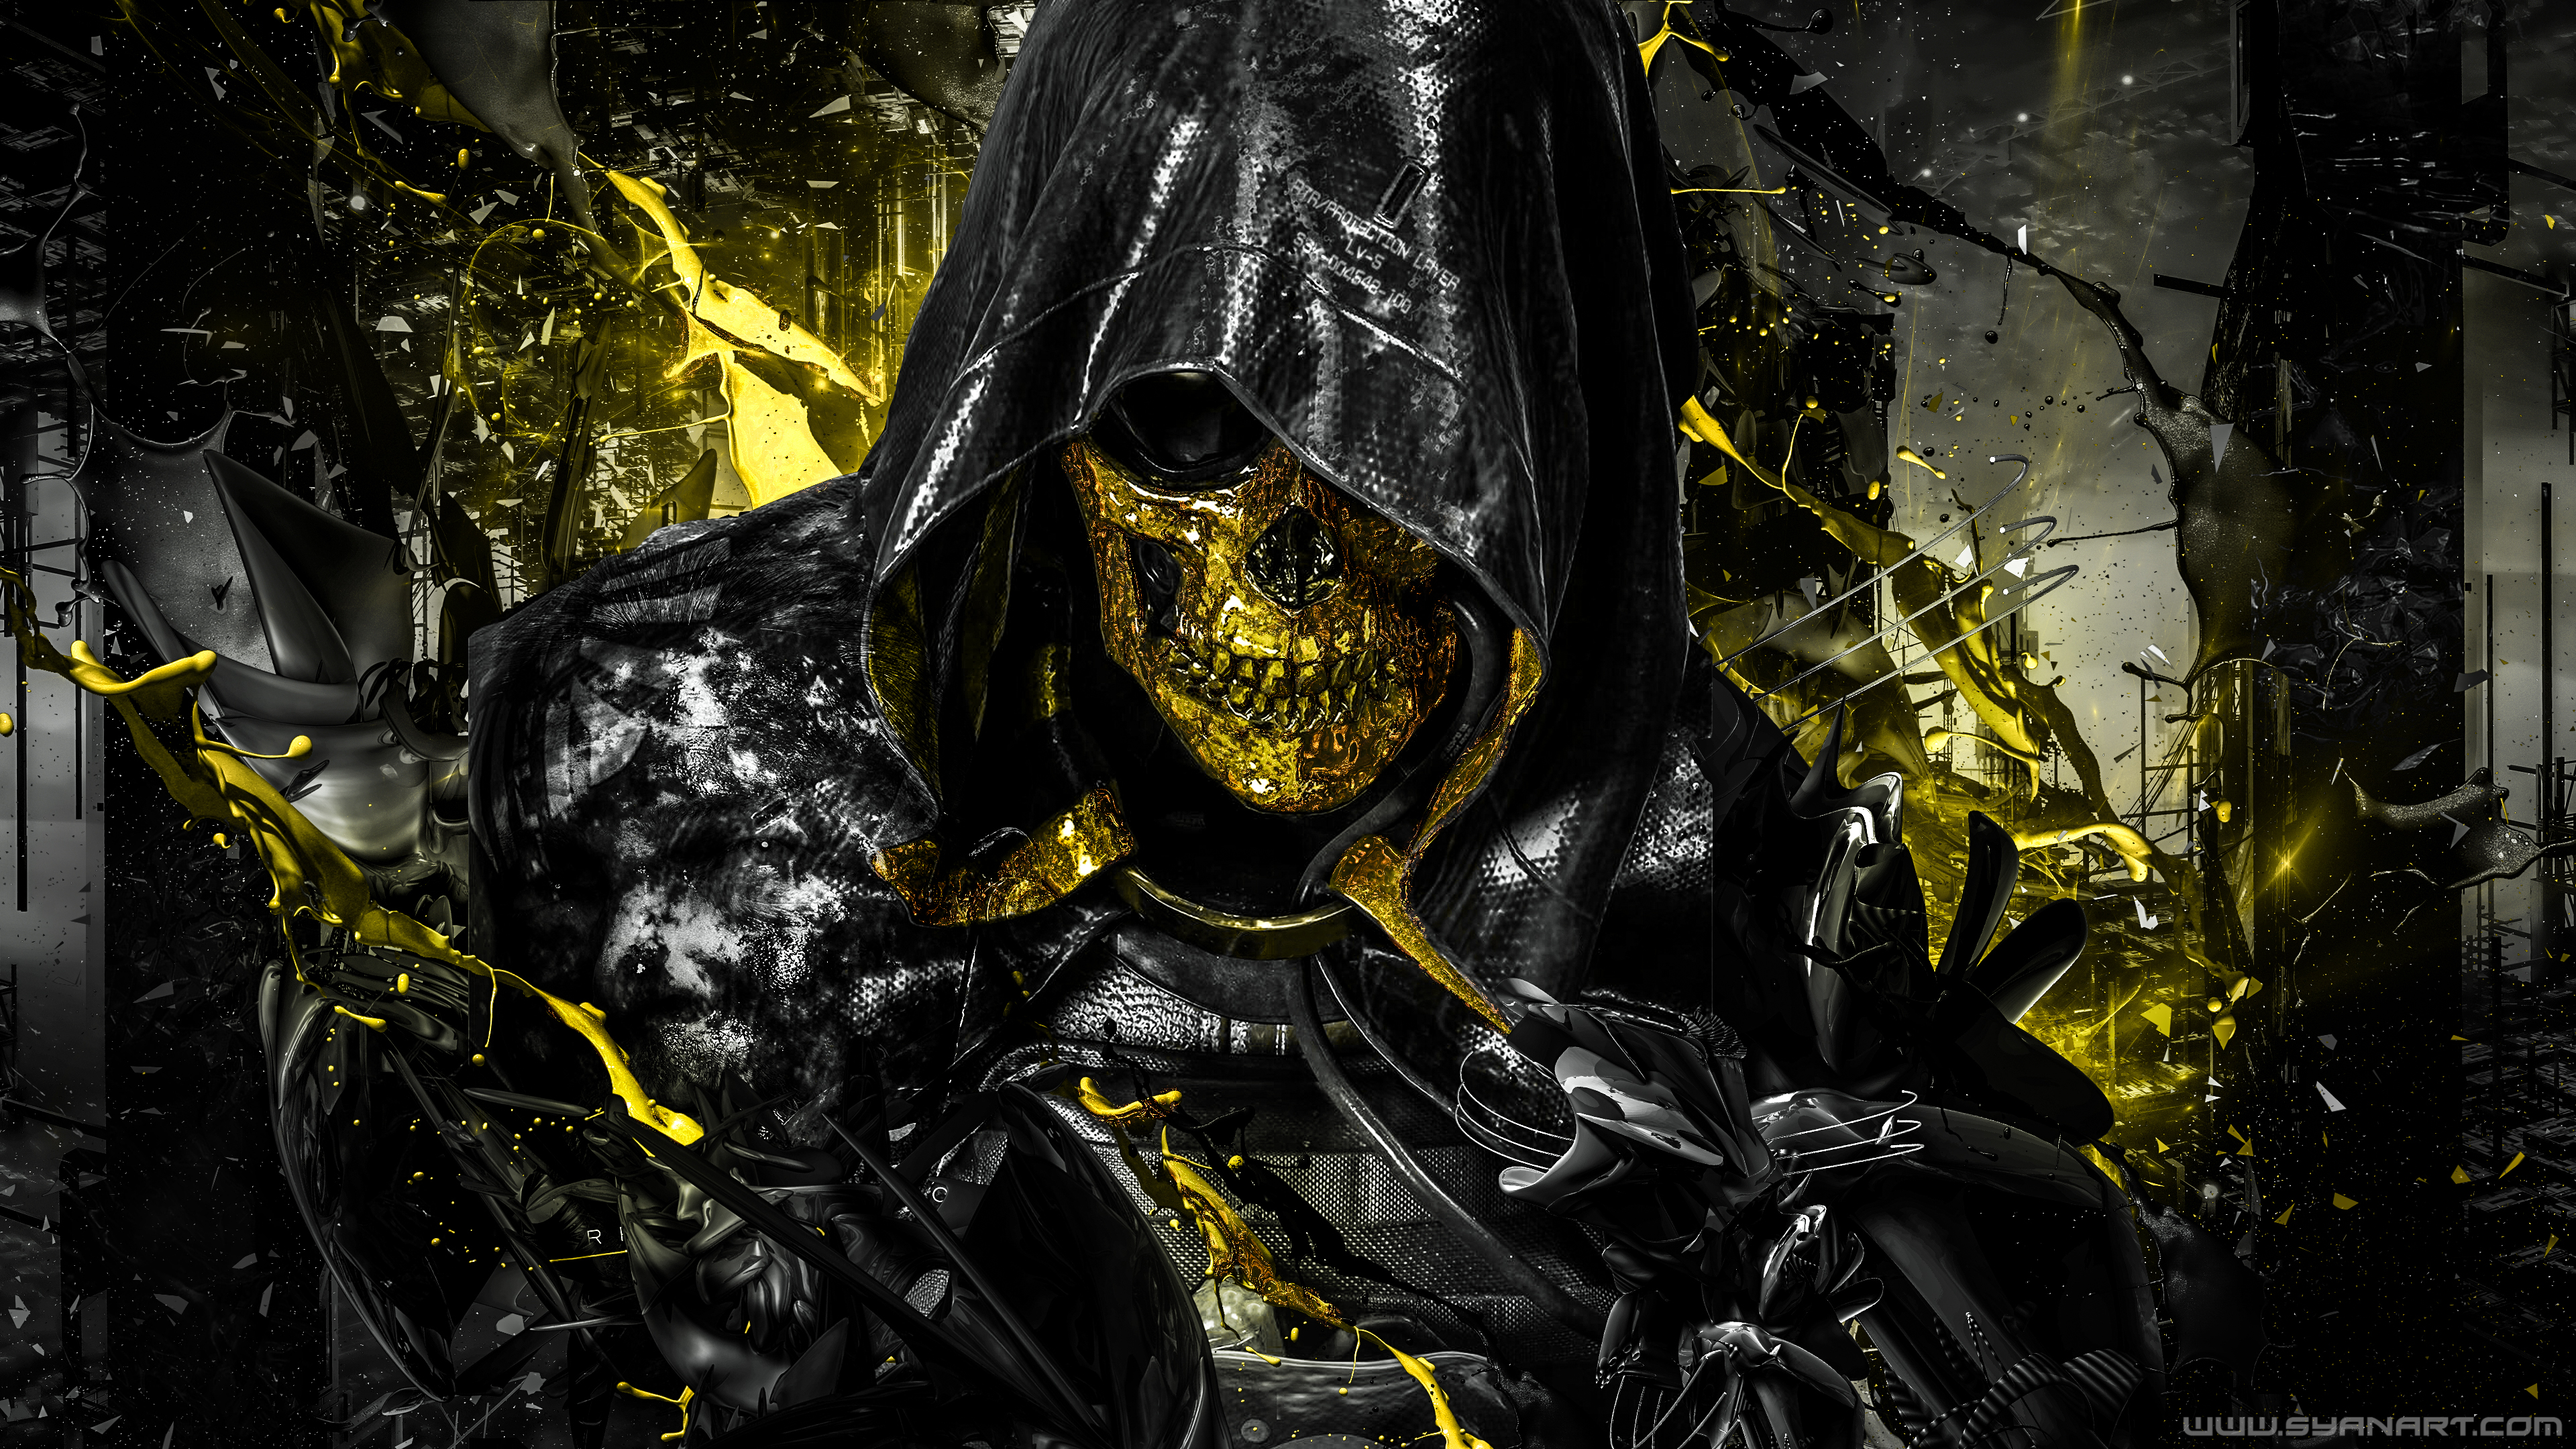 Death Stranding 2019 Game Wallpaper, HD Games 4K ...